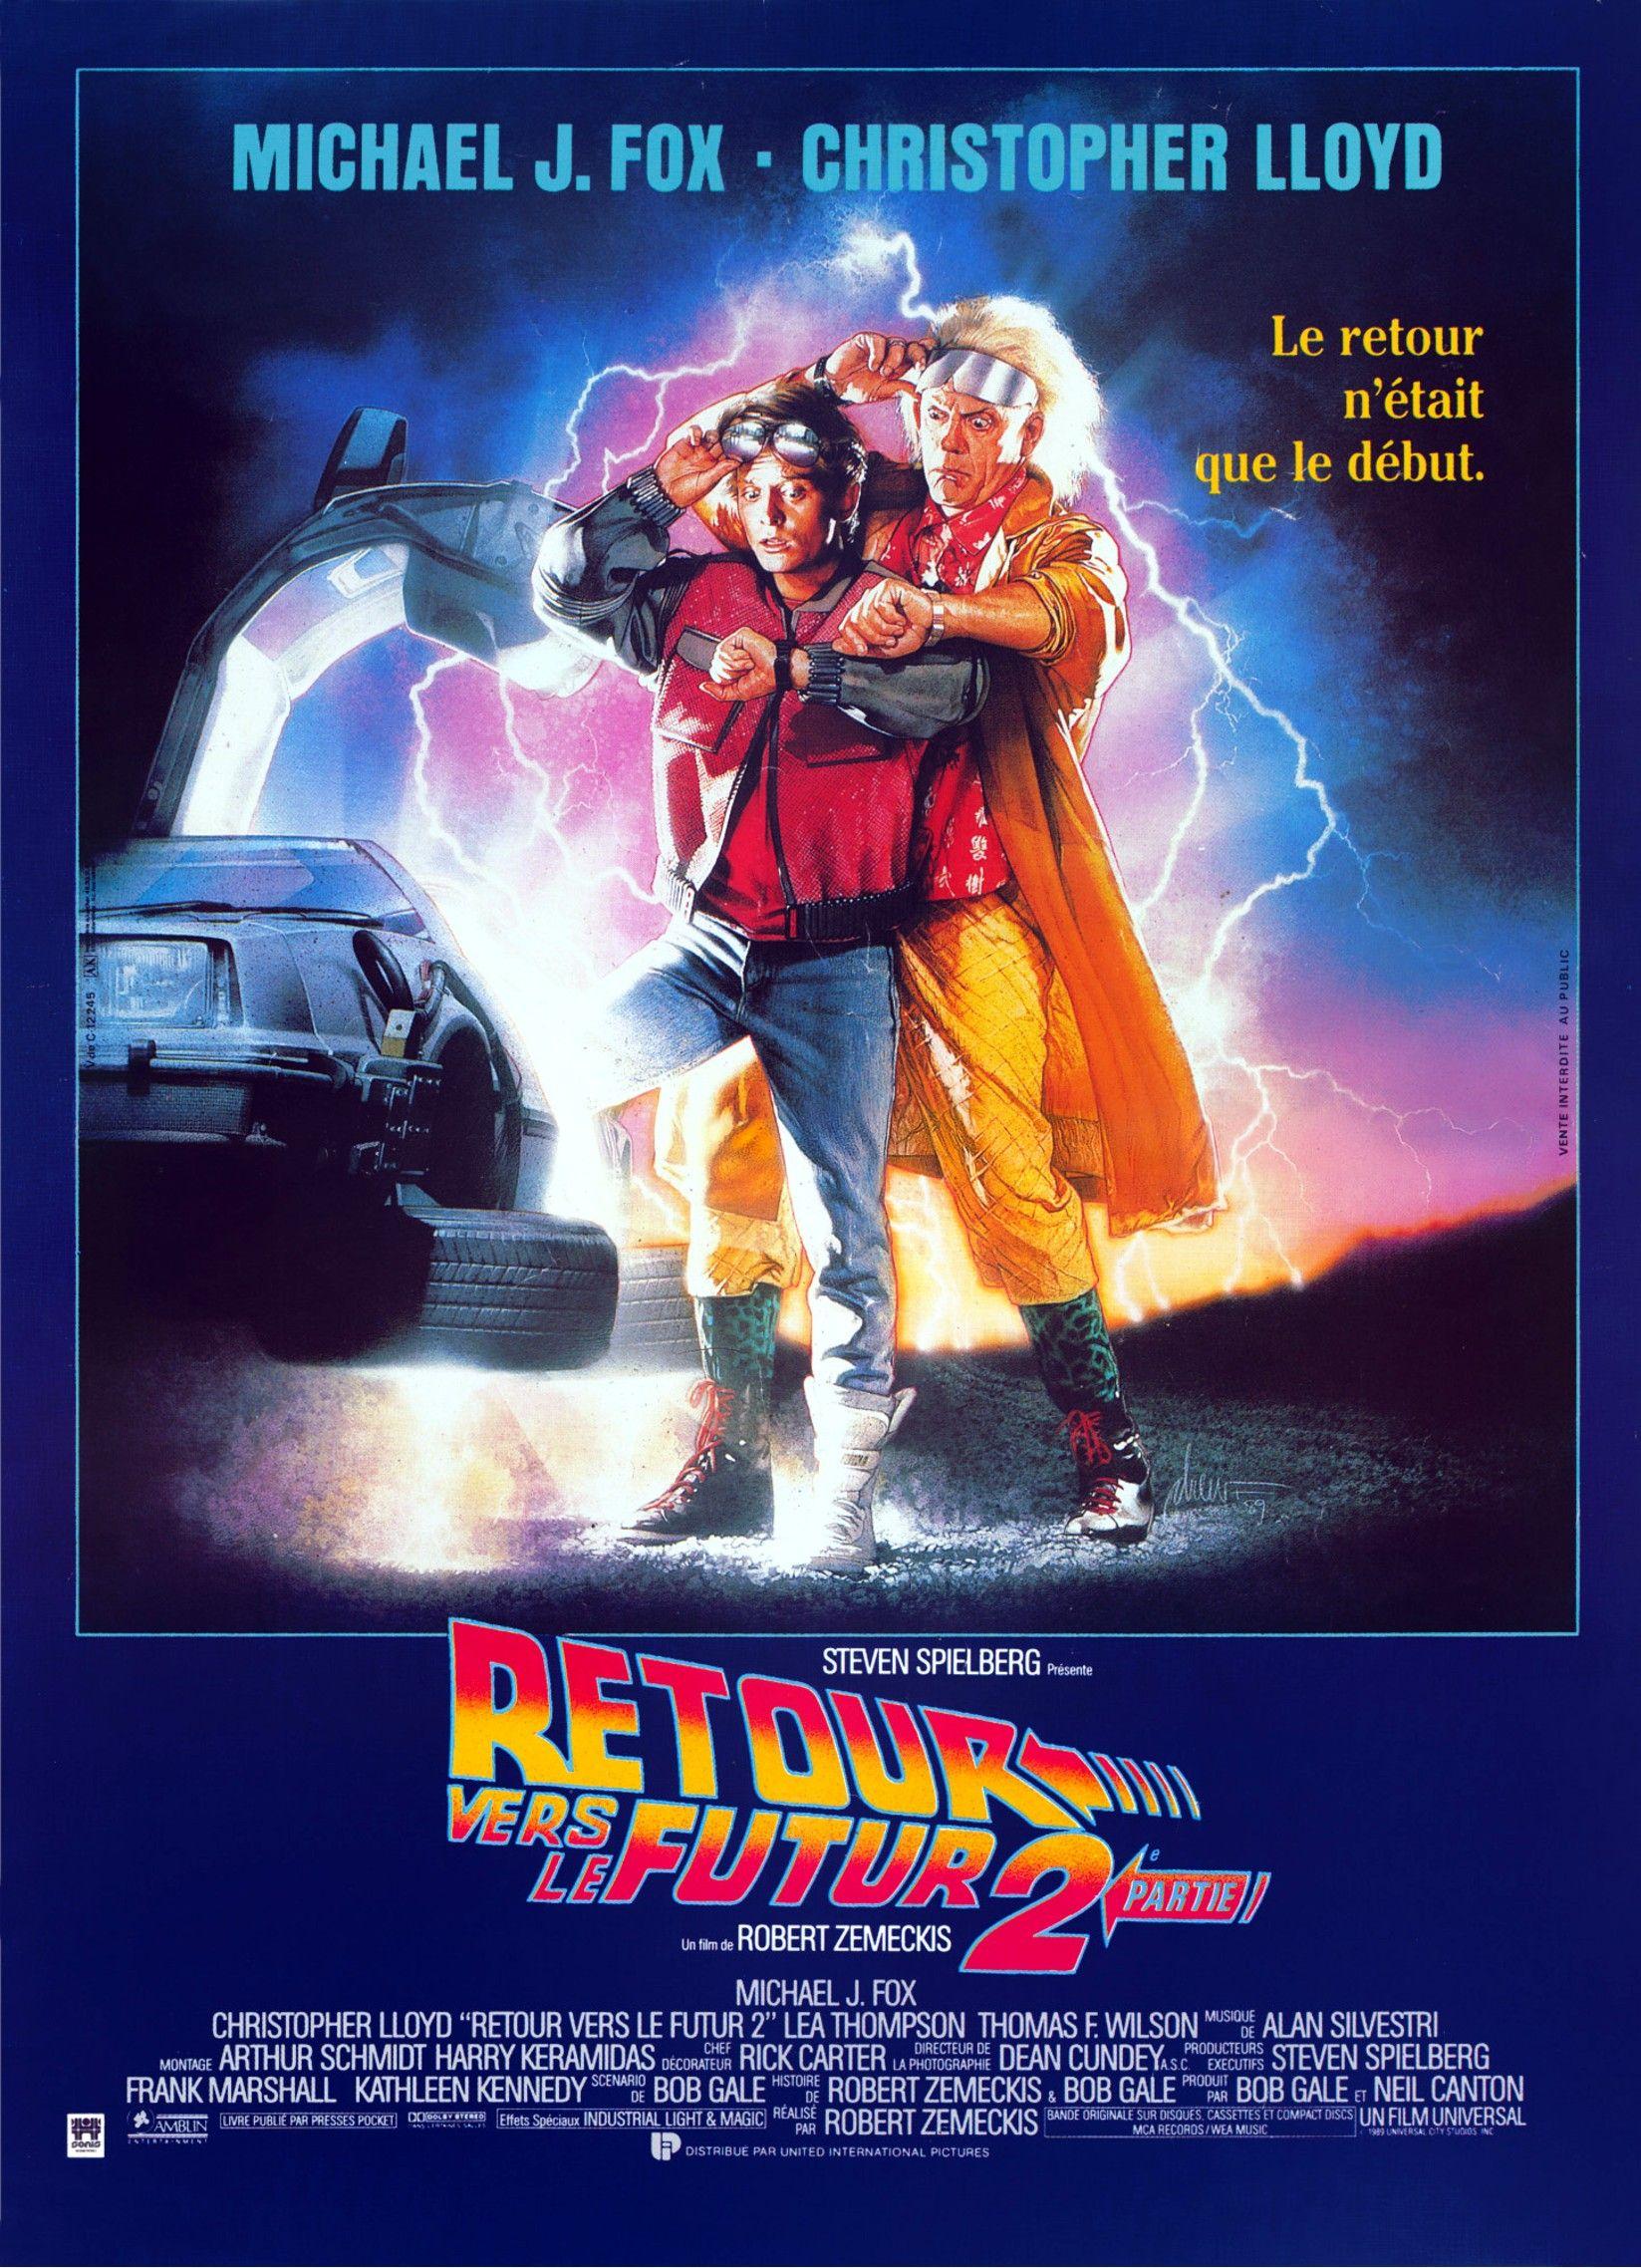 Retour vers le futur 2 1989 back to the future part ii 1 2 3 4 5 6